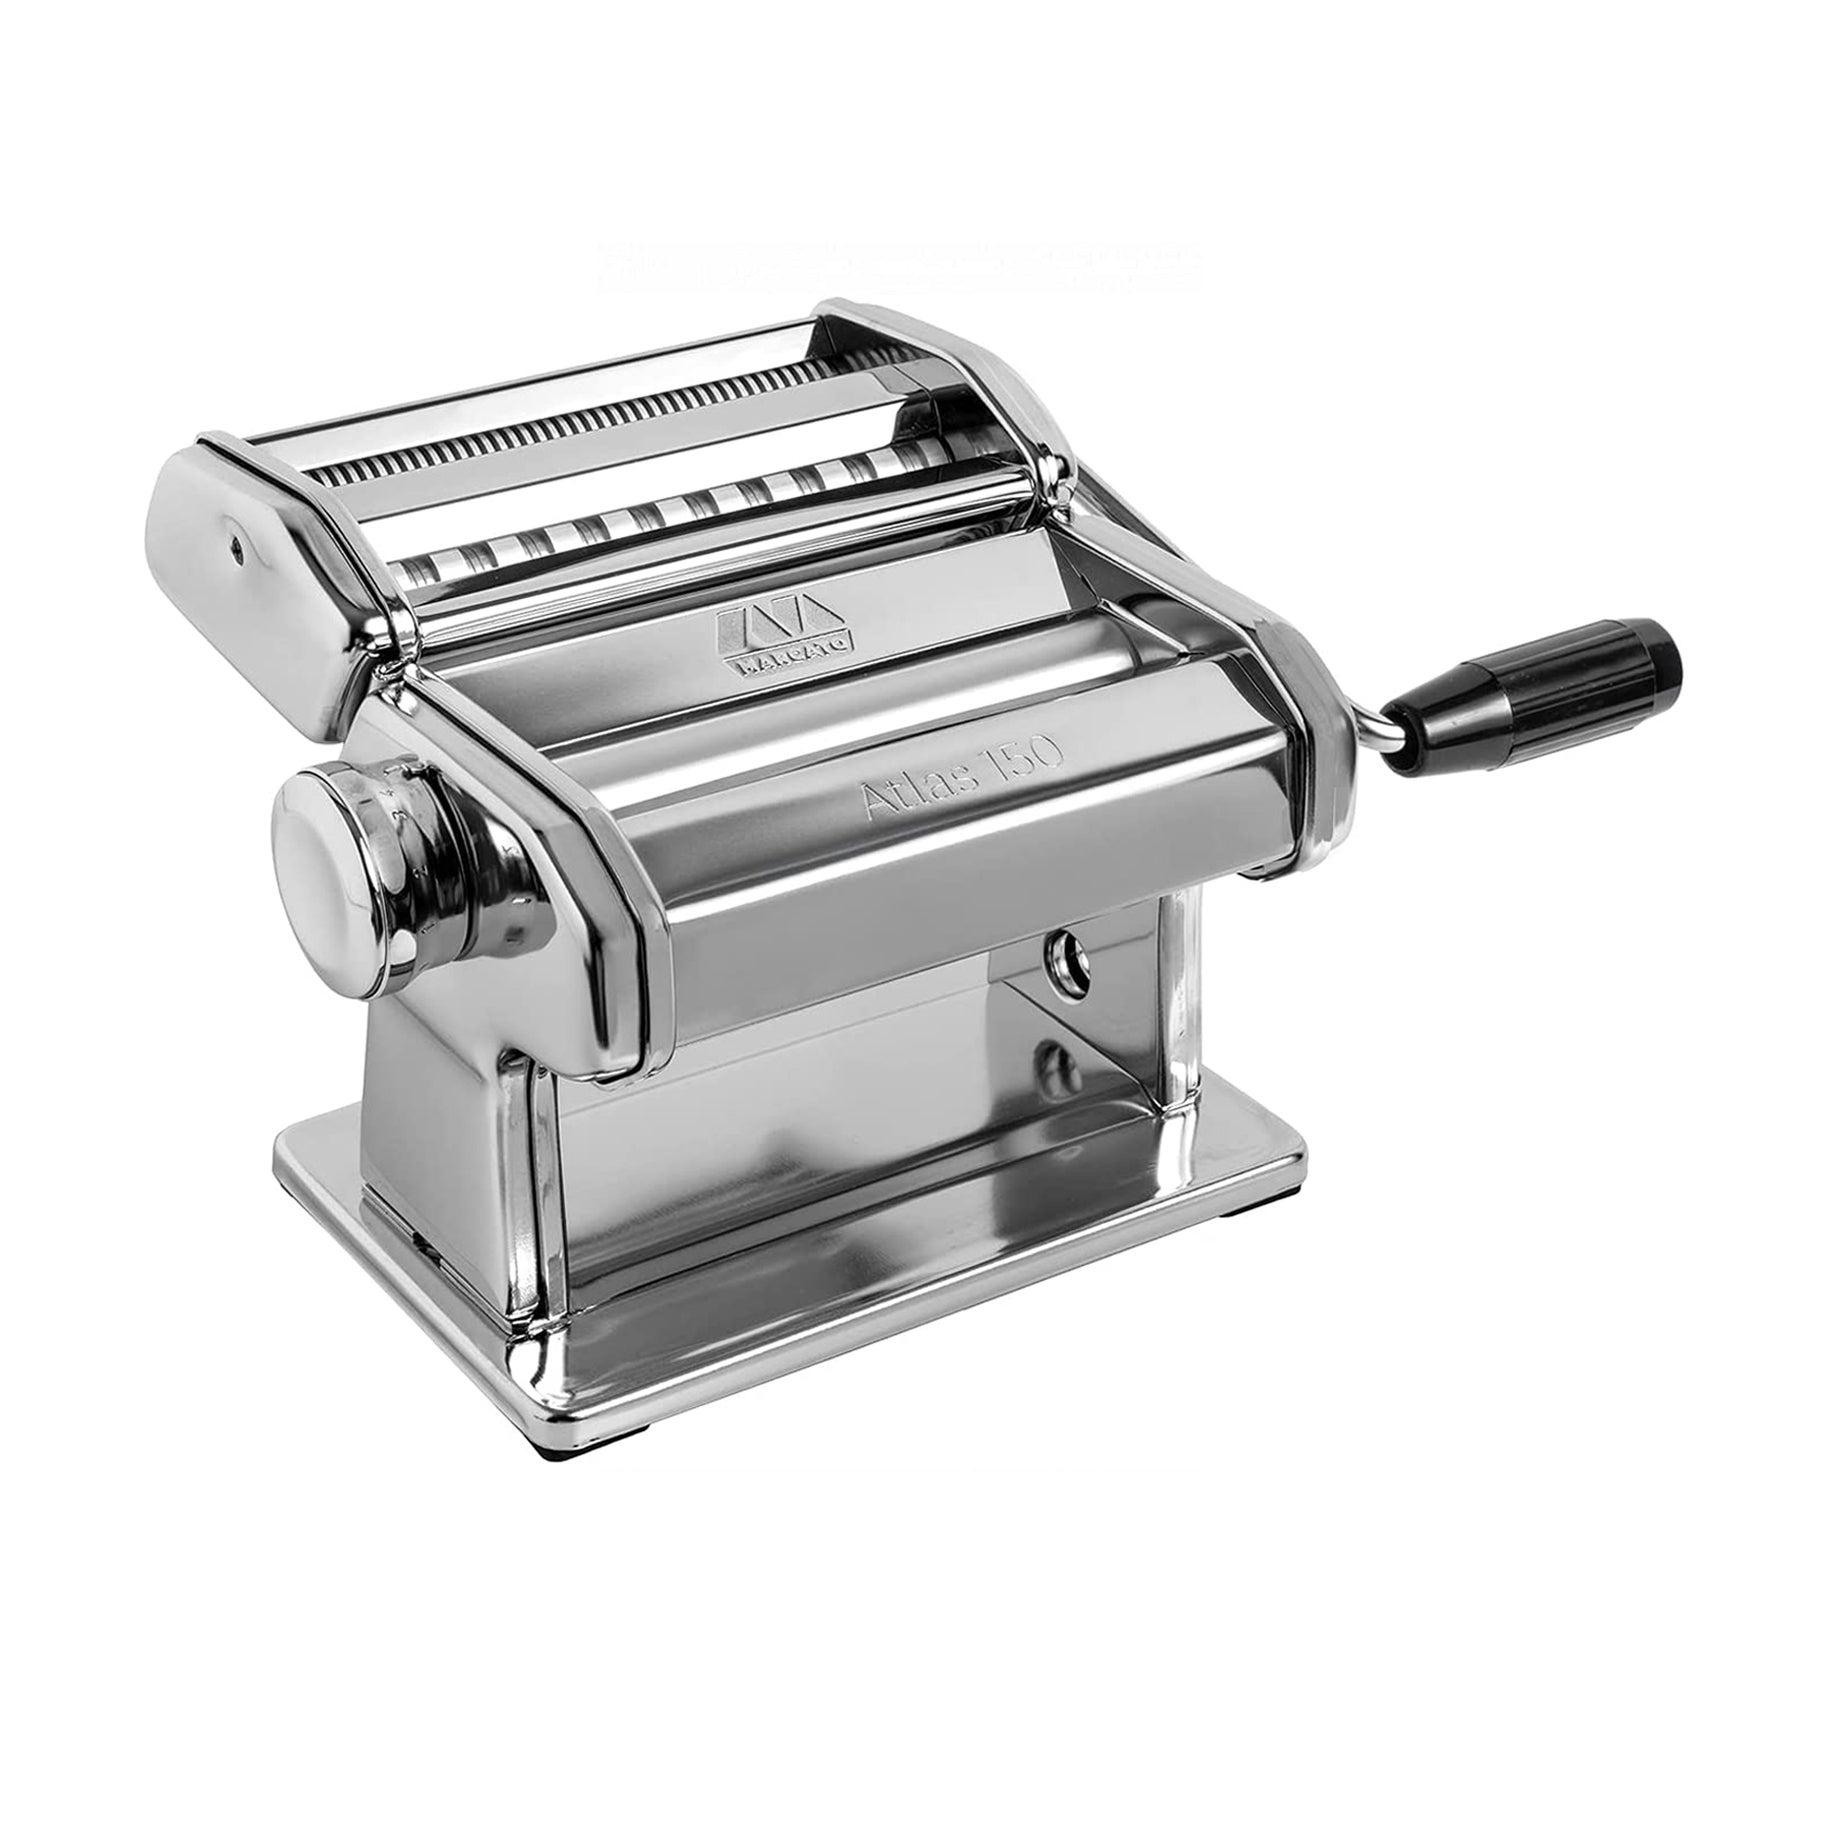 The Best Pasta Maker Option: Marcato Classic Atlas 150 Pasta Machine